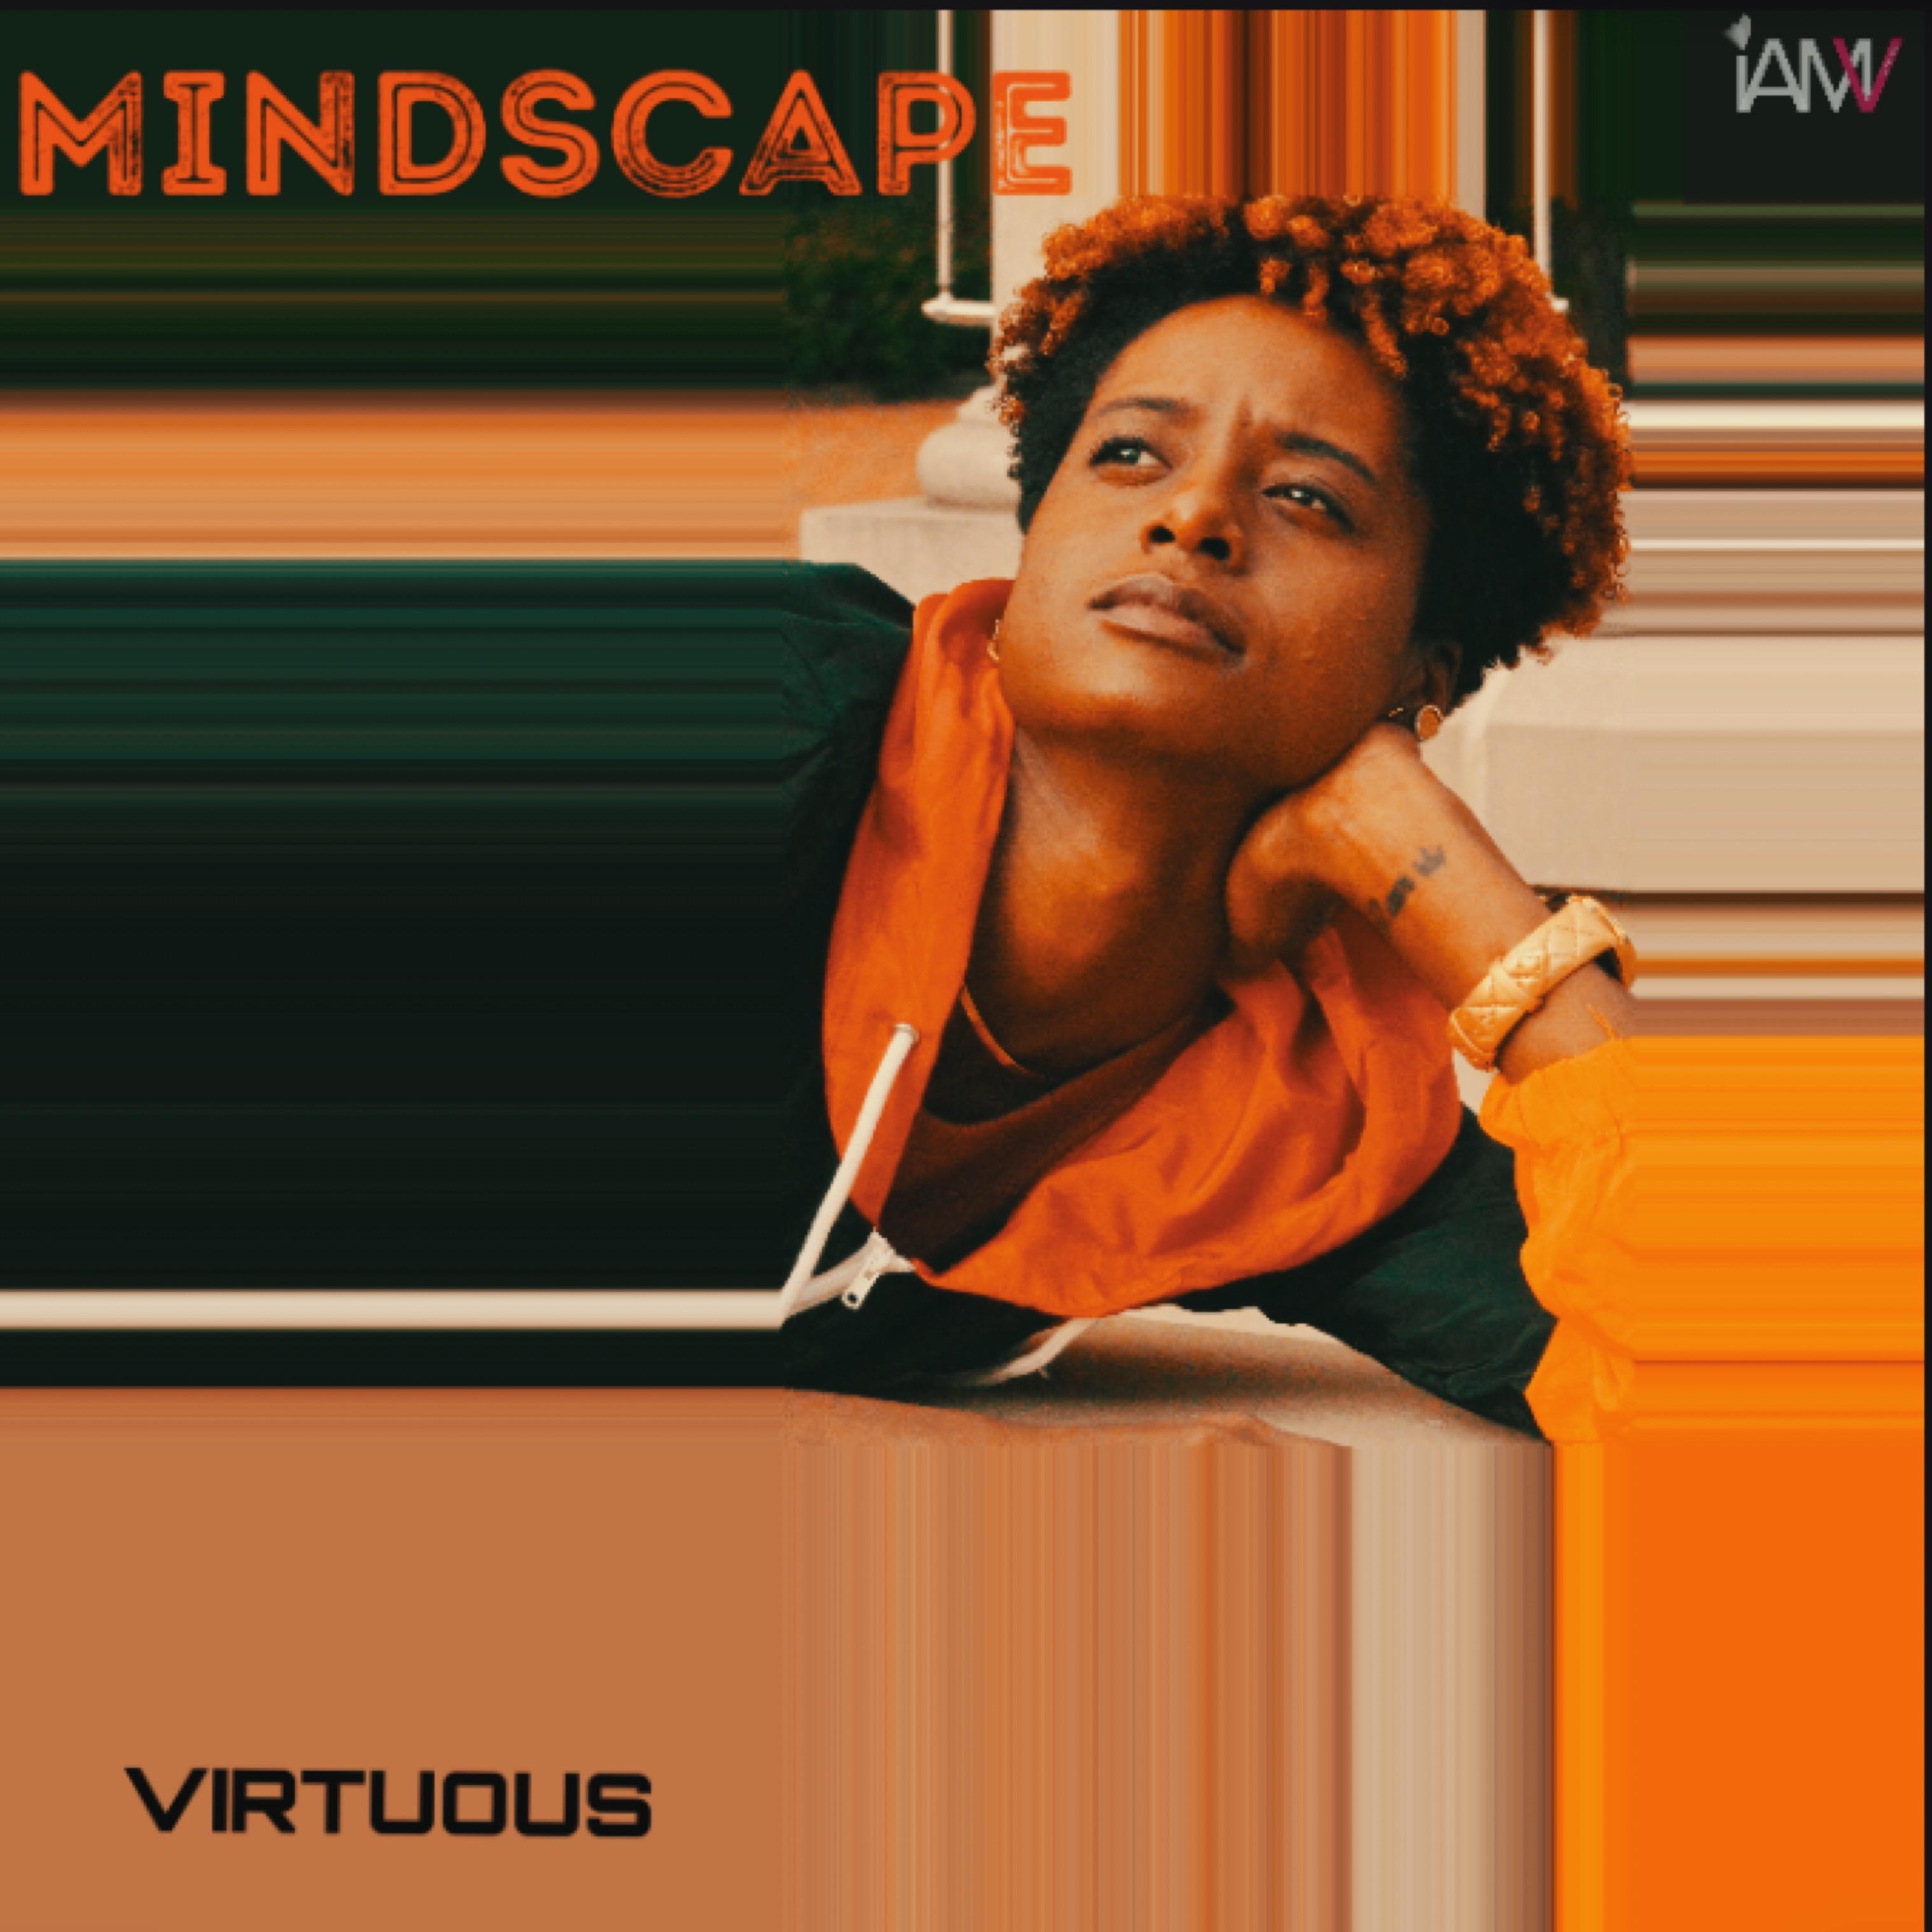 Virtuous - Quick Links Mindscape (iTunes)/Apple Music Link Thumbnail | Linktree